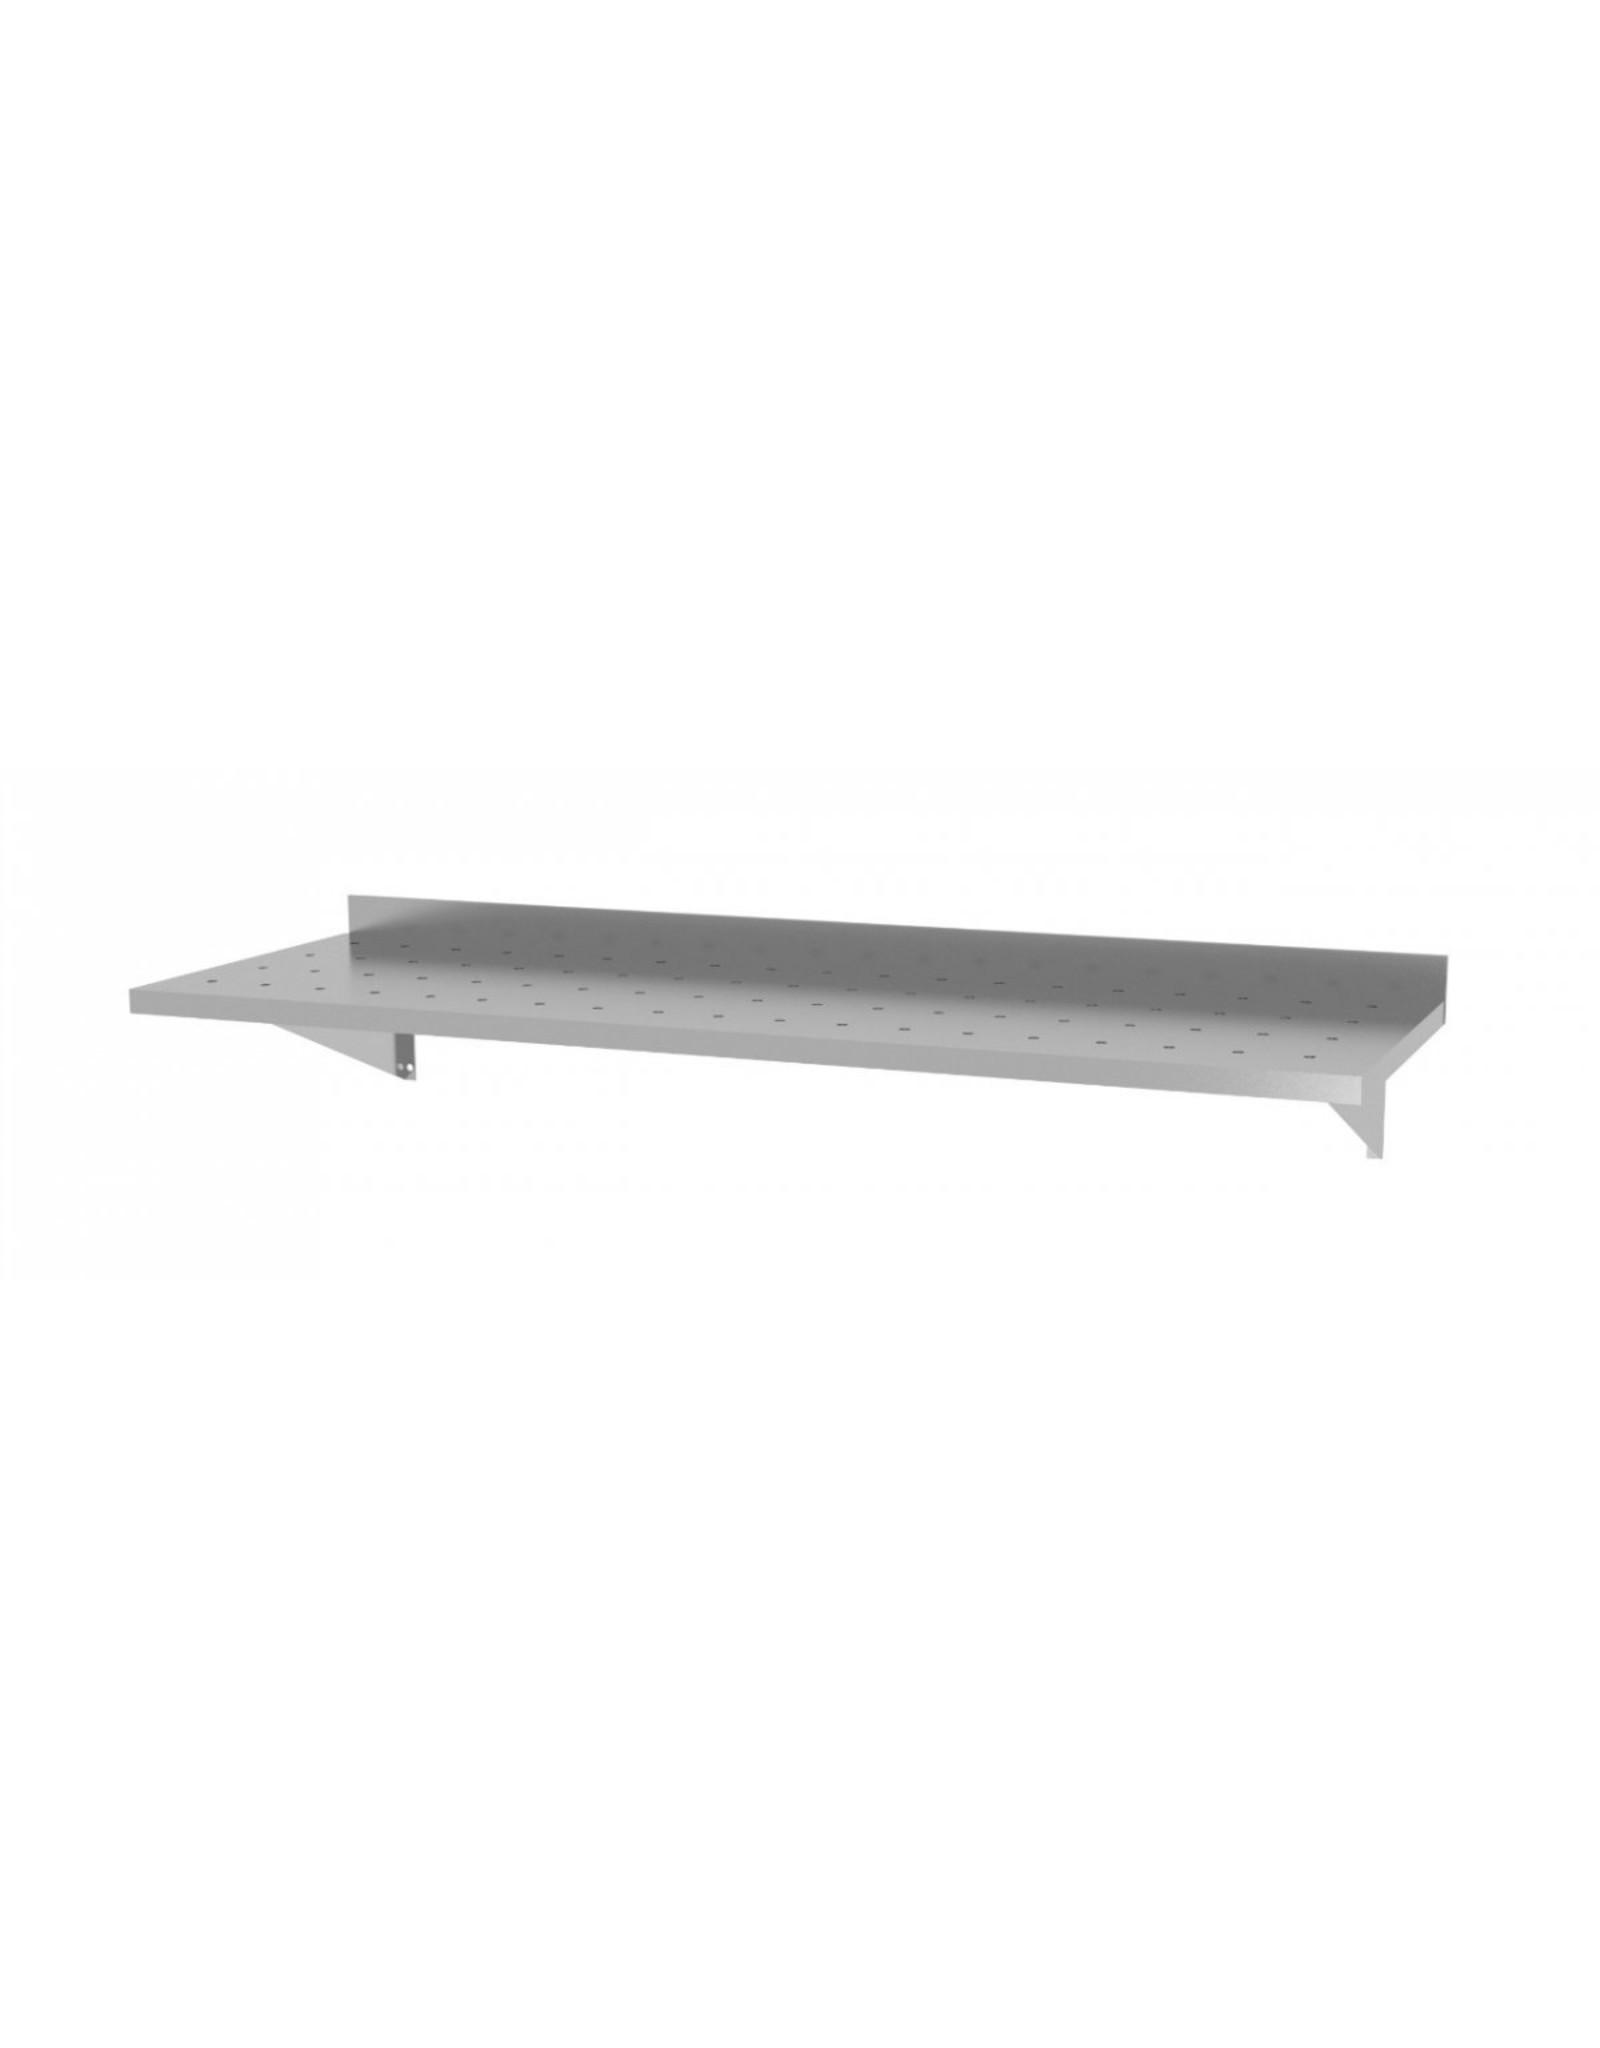 Wandplank geperforeerd vast model | met 2 beugels | 600-1500mm breed | 300 of 400mm diep